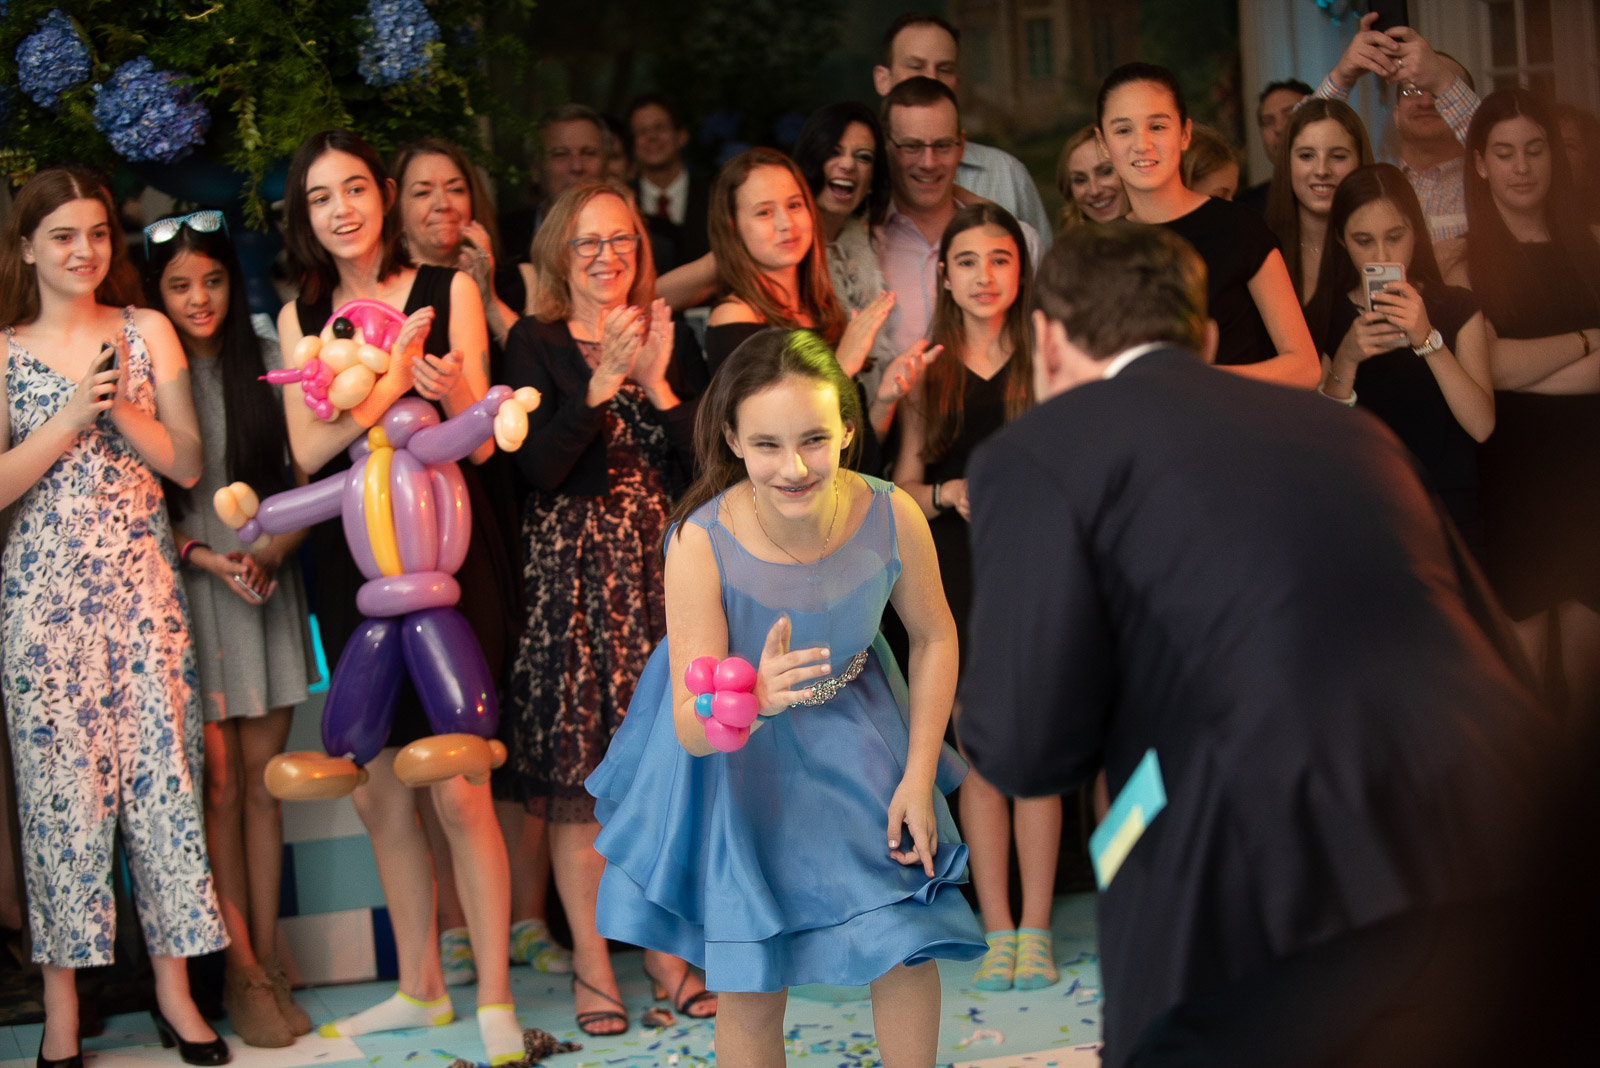 Copy of Bat mitzvah hora dancing